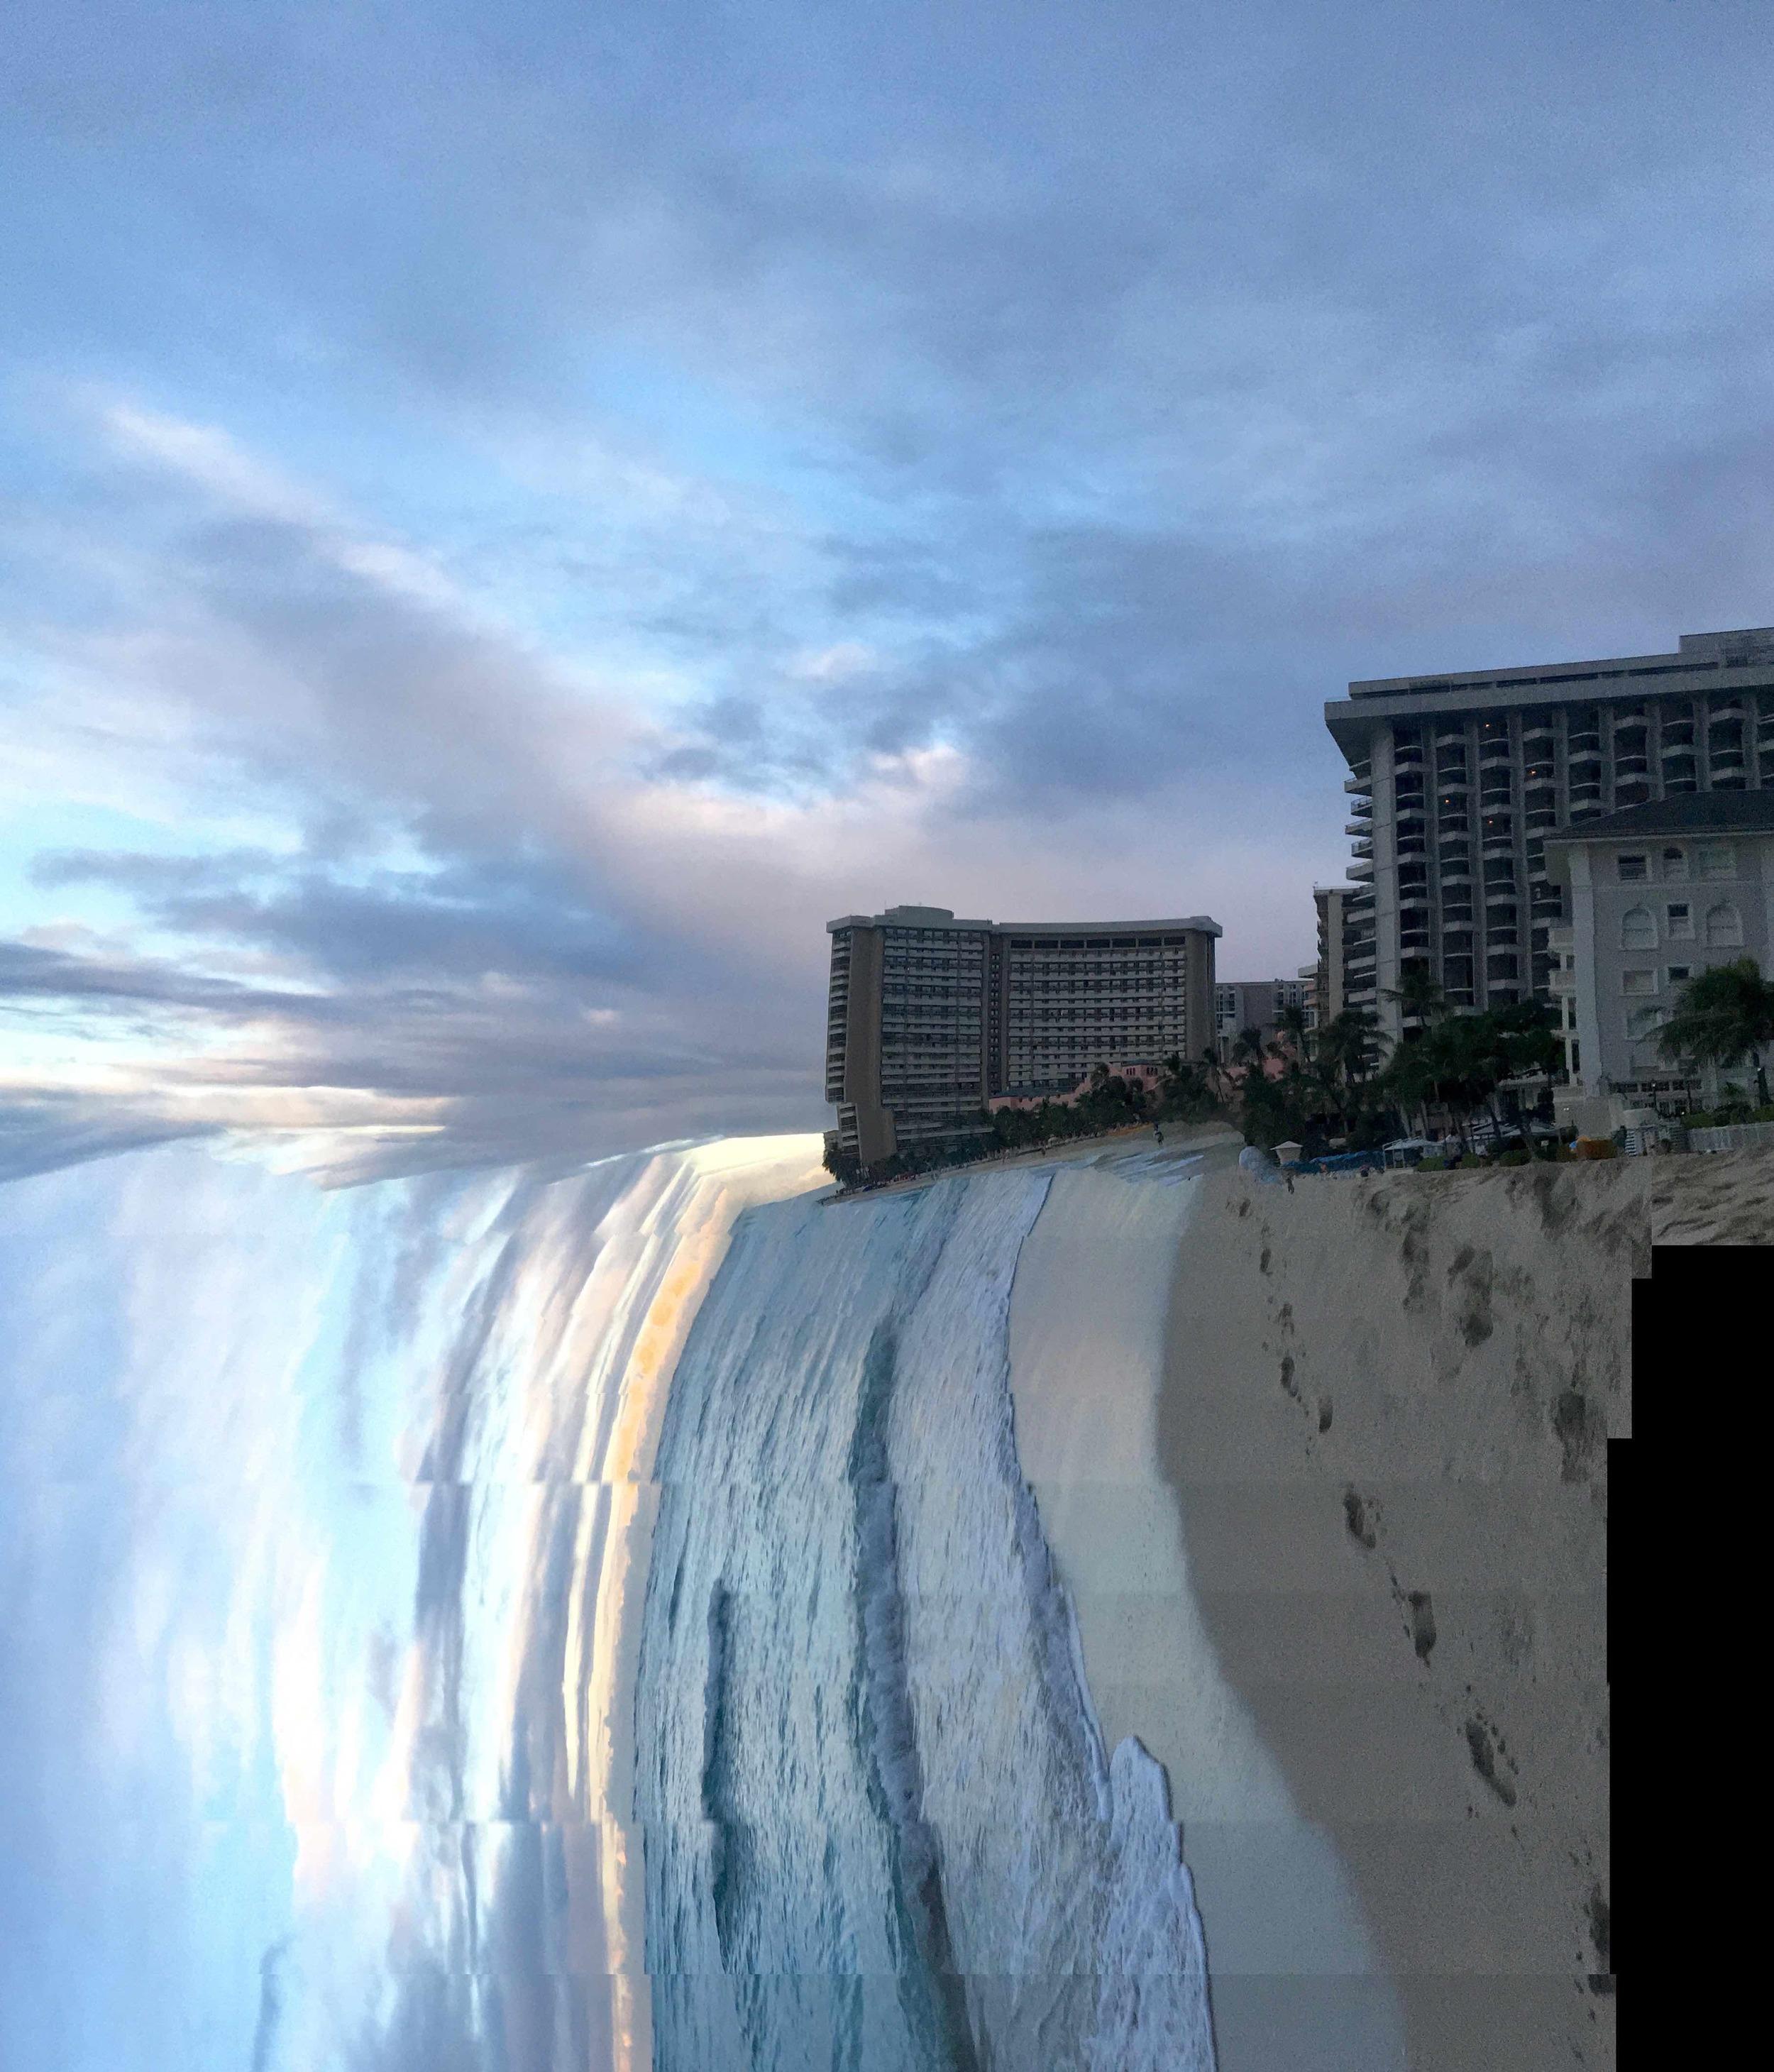 Waikiki Beach,20 January 2016_3  Photograph c  opyright © Tennyson Woodbridge, 1963 to present